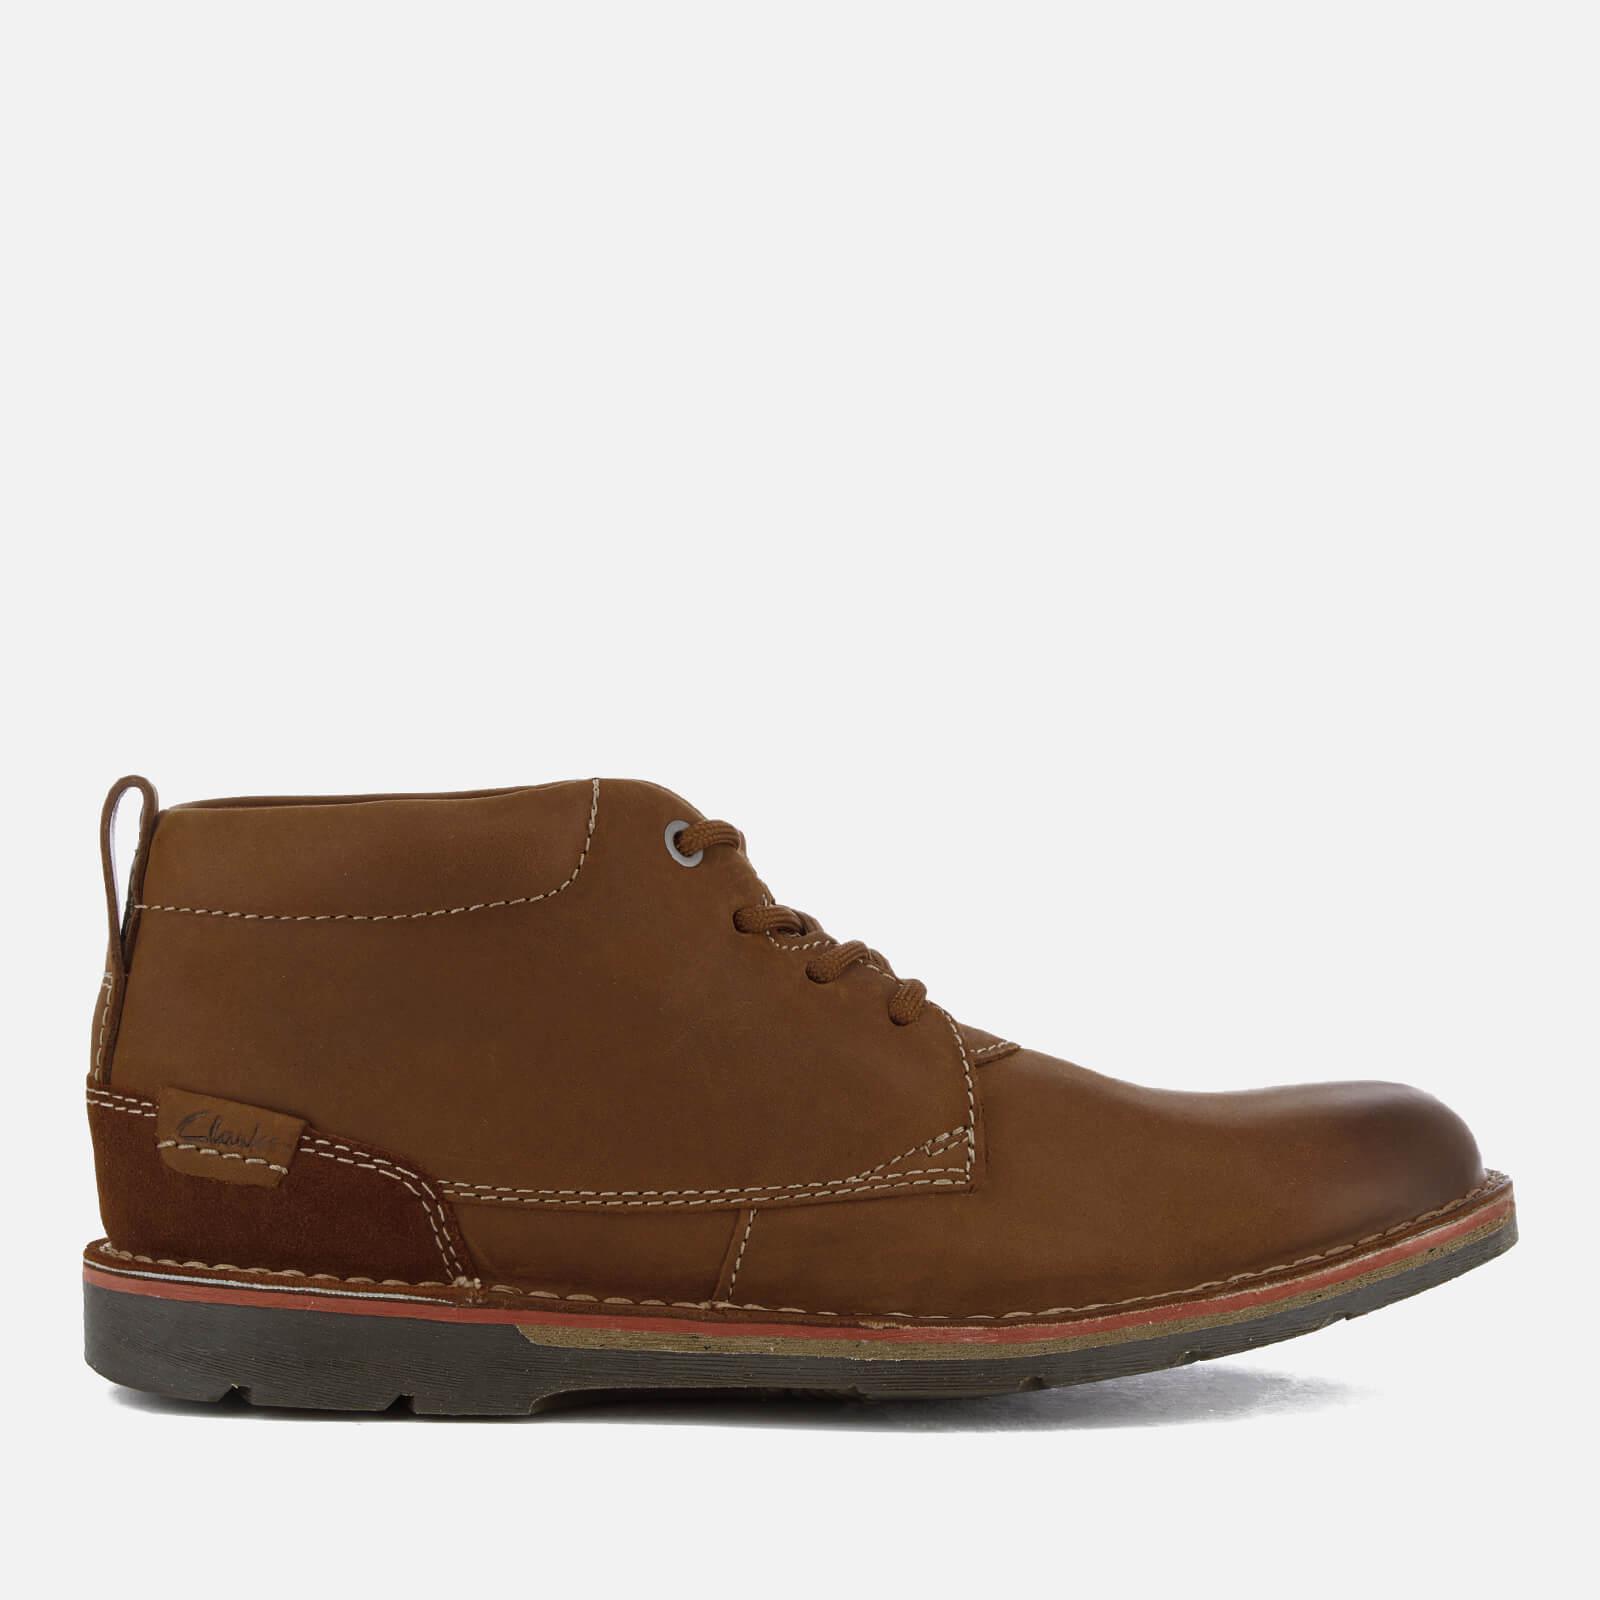 Lyst Clarks Men S Edgewick Mid Nubuck Chukka Boots In